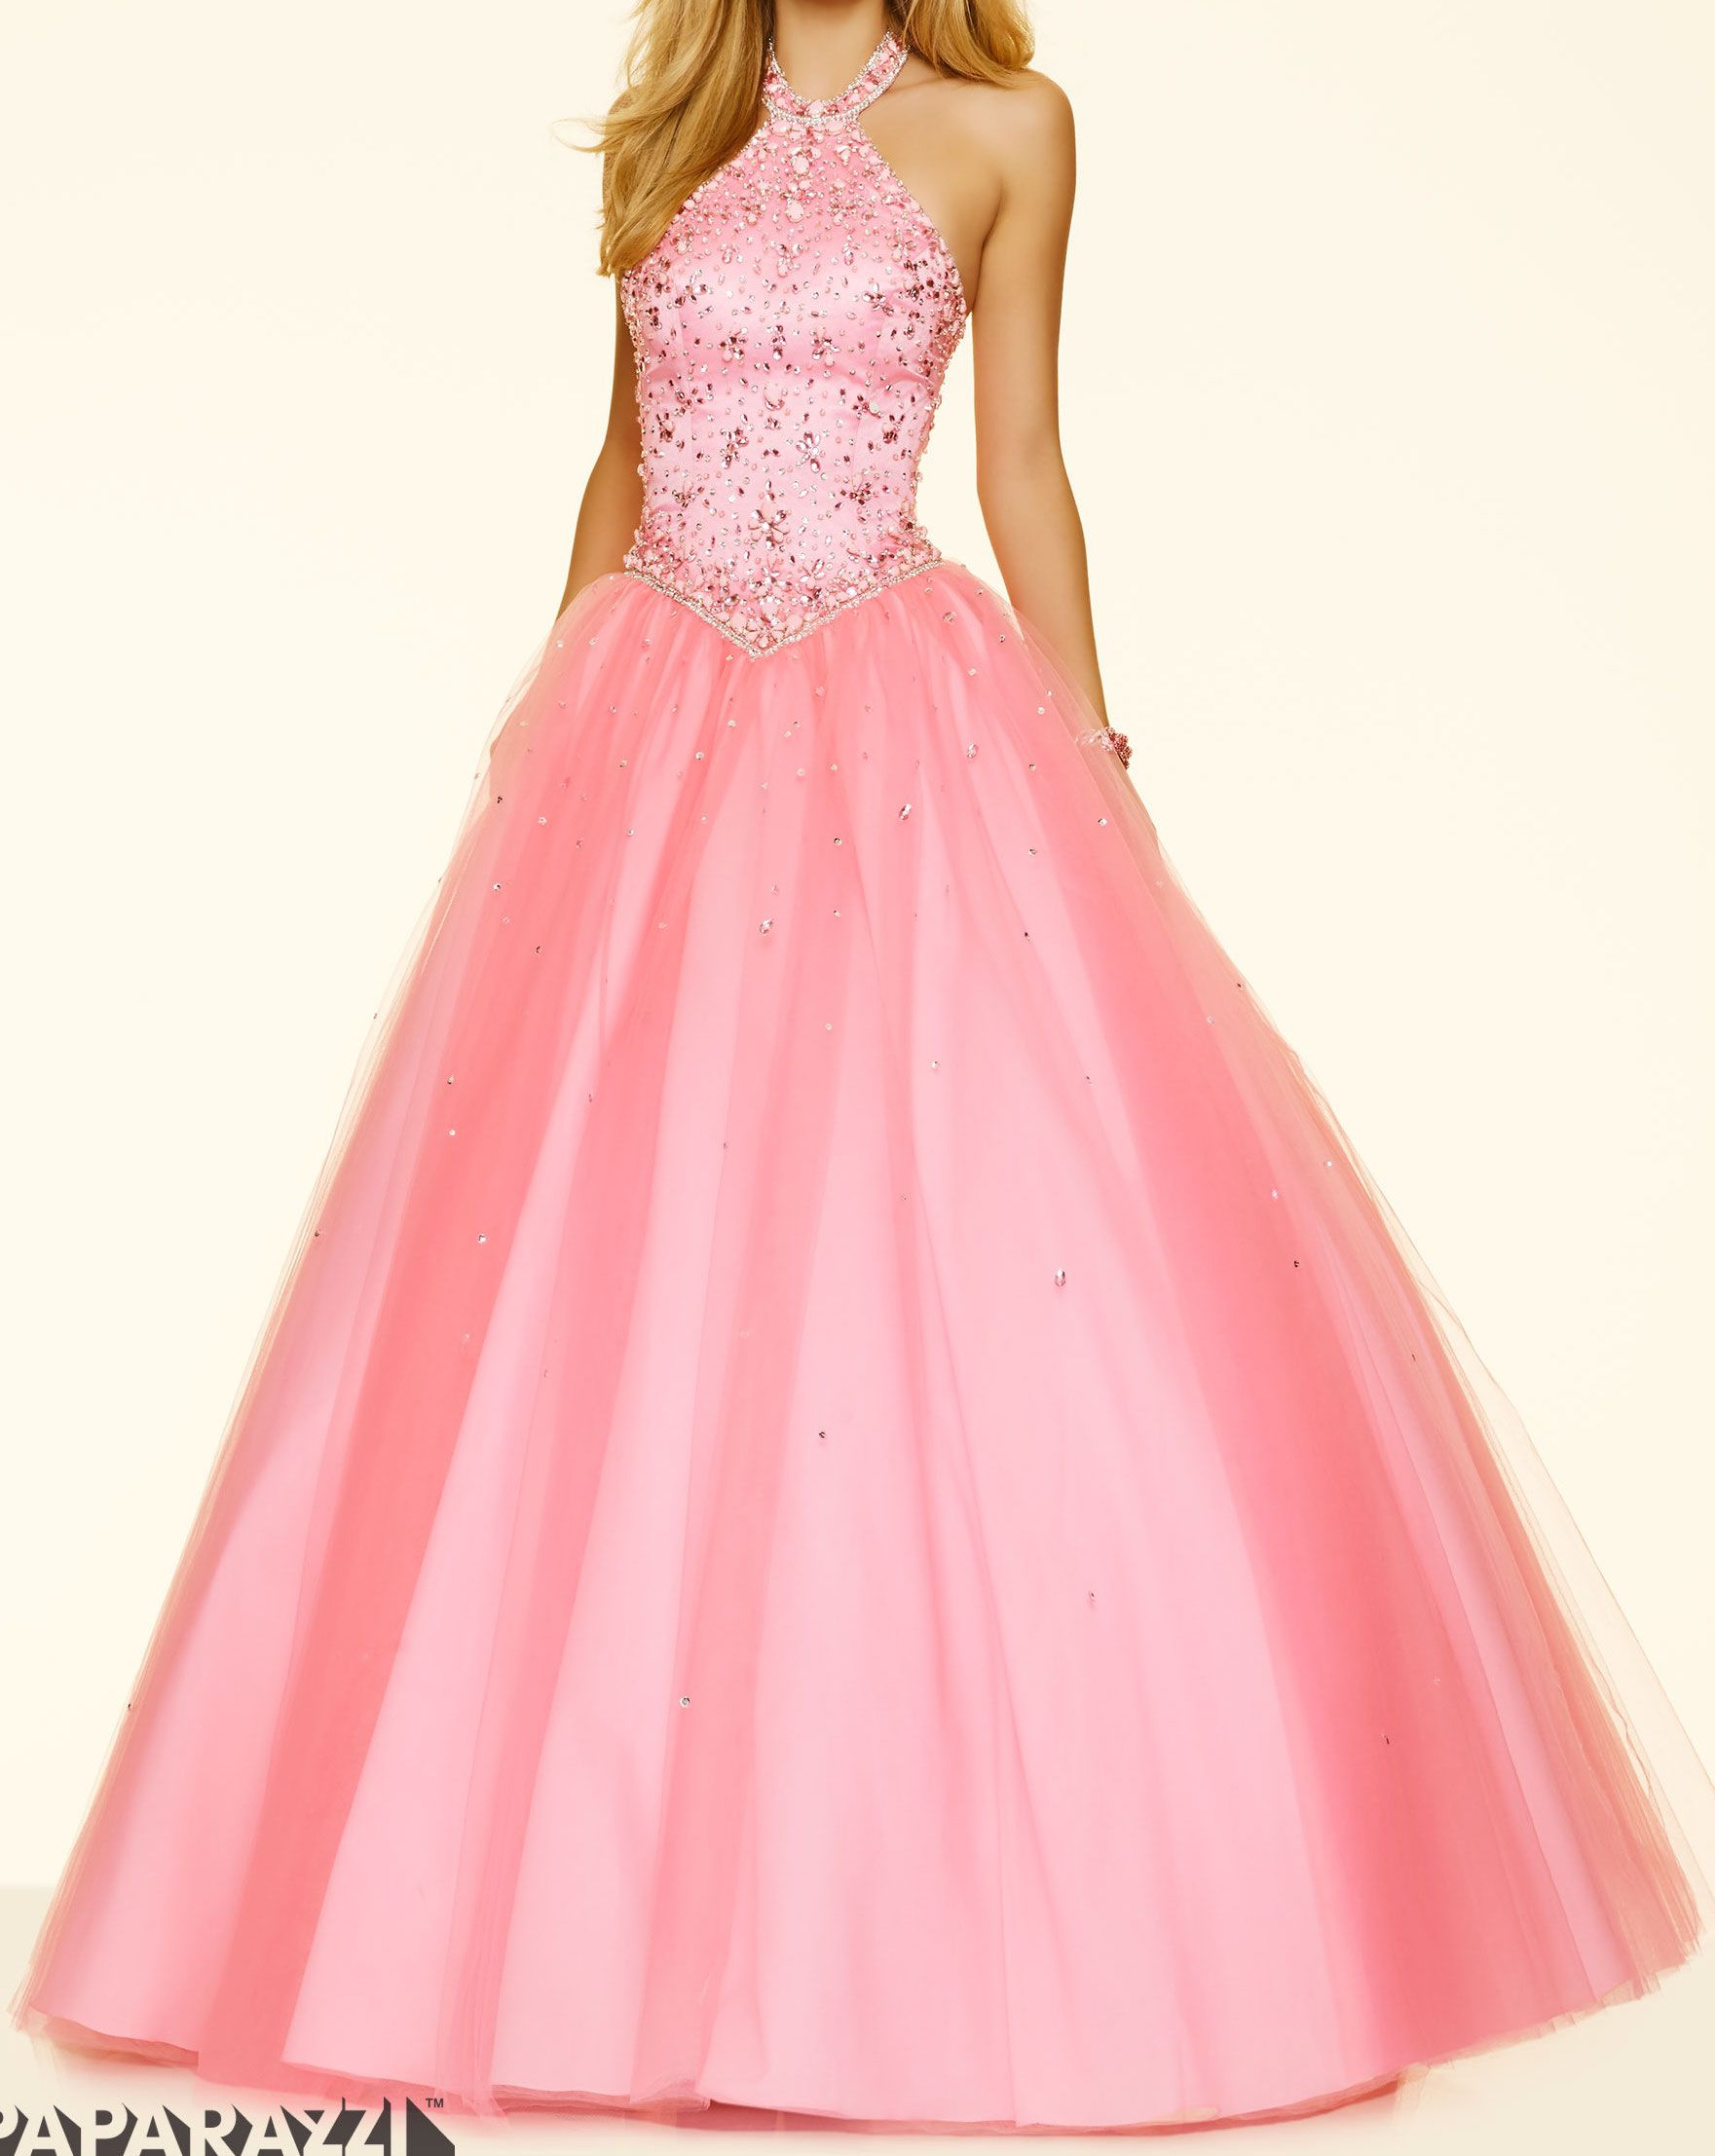 Stunning pink | Thiết kế | Pinterest